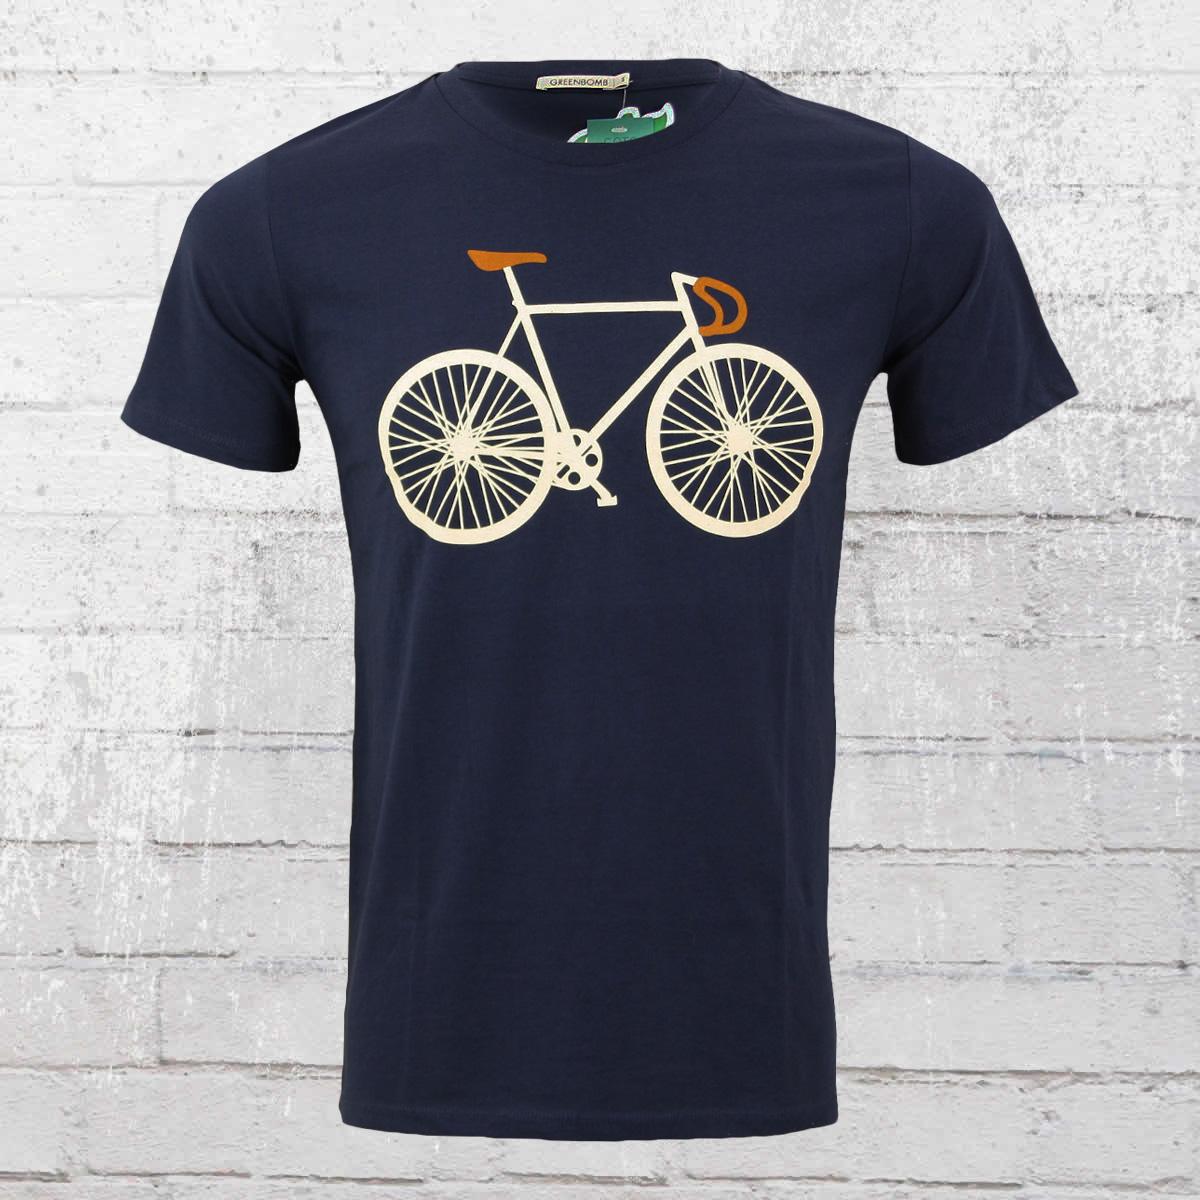 jetzt bestellen greenbomb m nner fahrrad t shirt bike. Black Bedroom Furniture Sets. Home Design Ideas